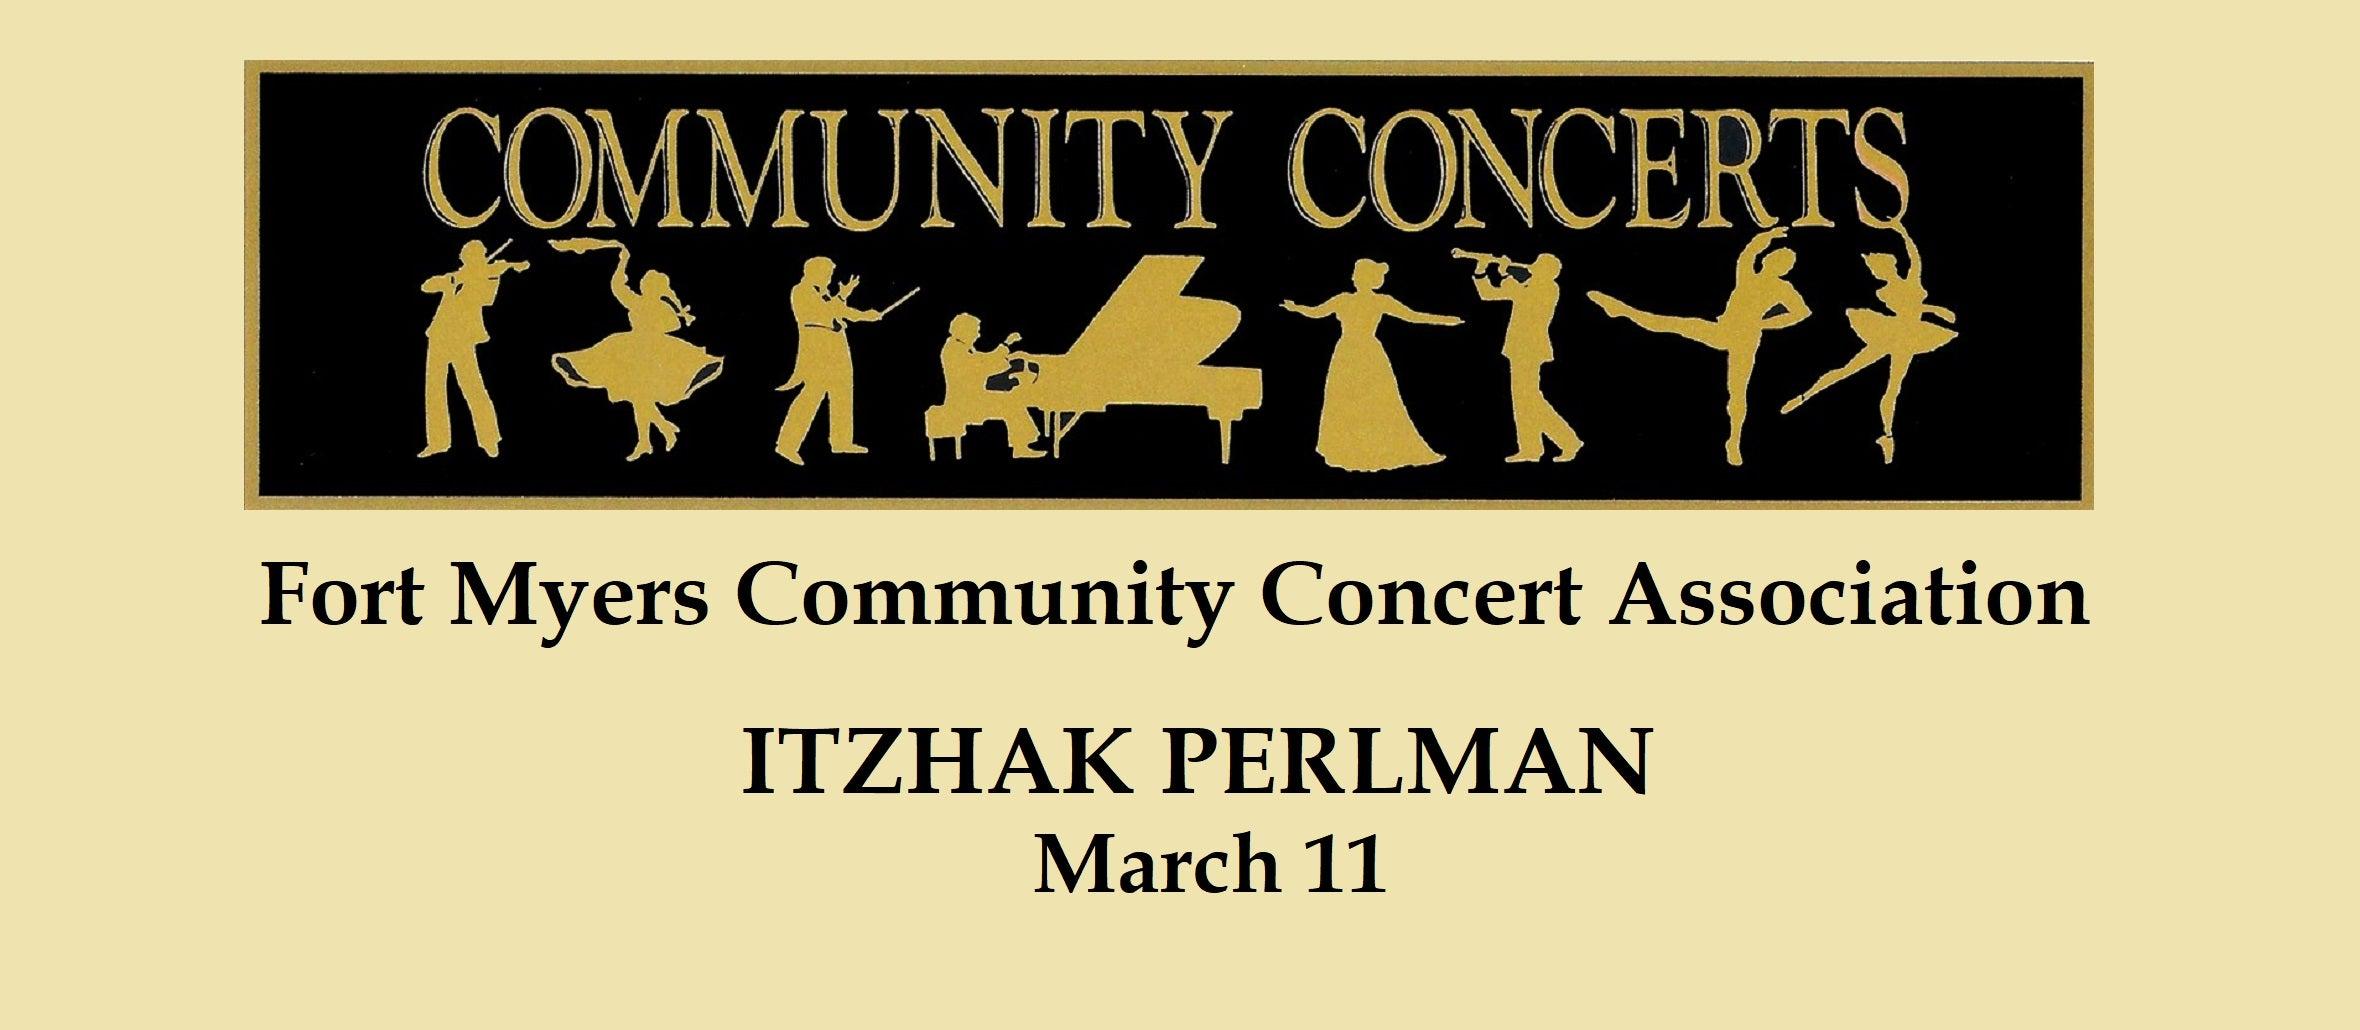 Fort Myers Community Concert: Itzhak Perlman